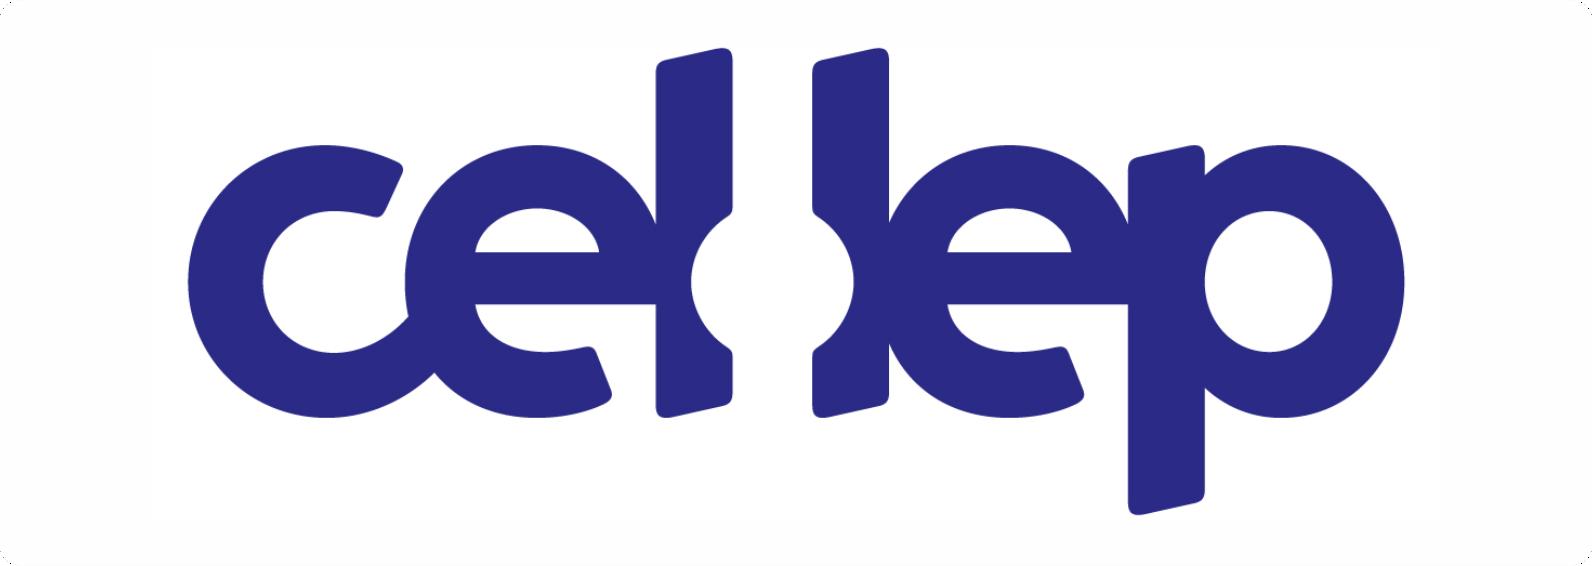 https://www.abraphe.org.br/wp-content/uploads/2020/12/logo-cellep.png